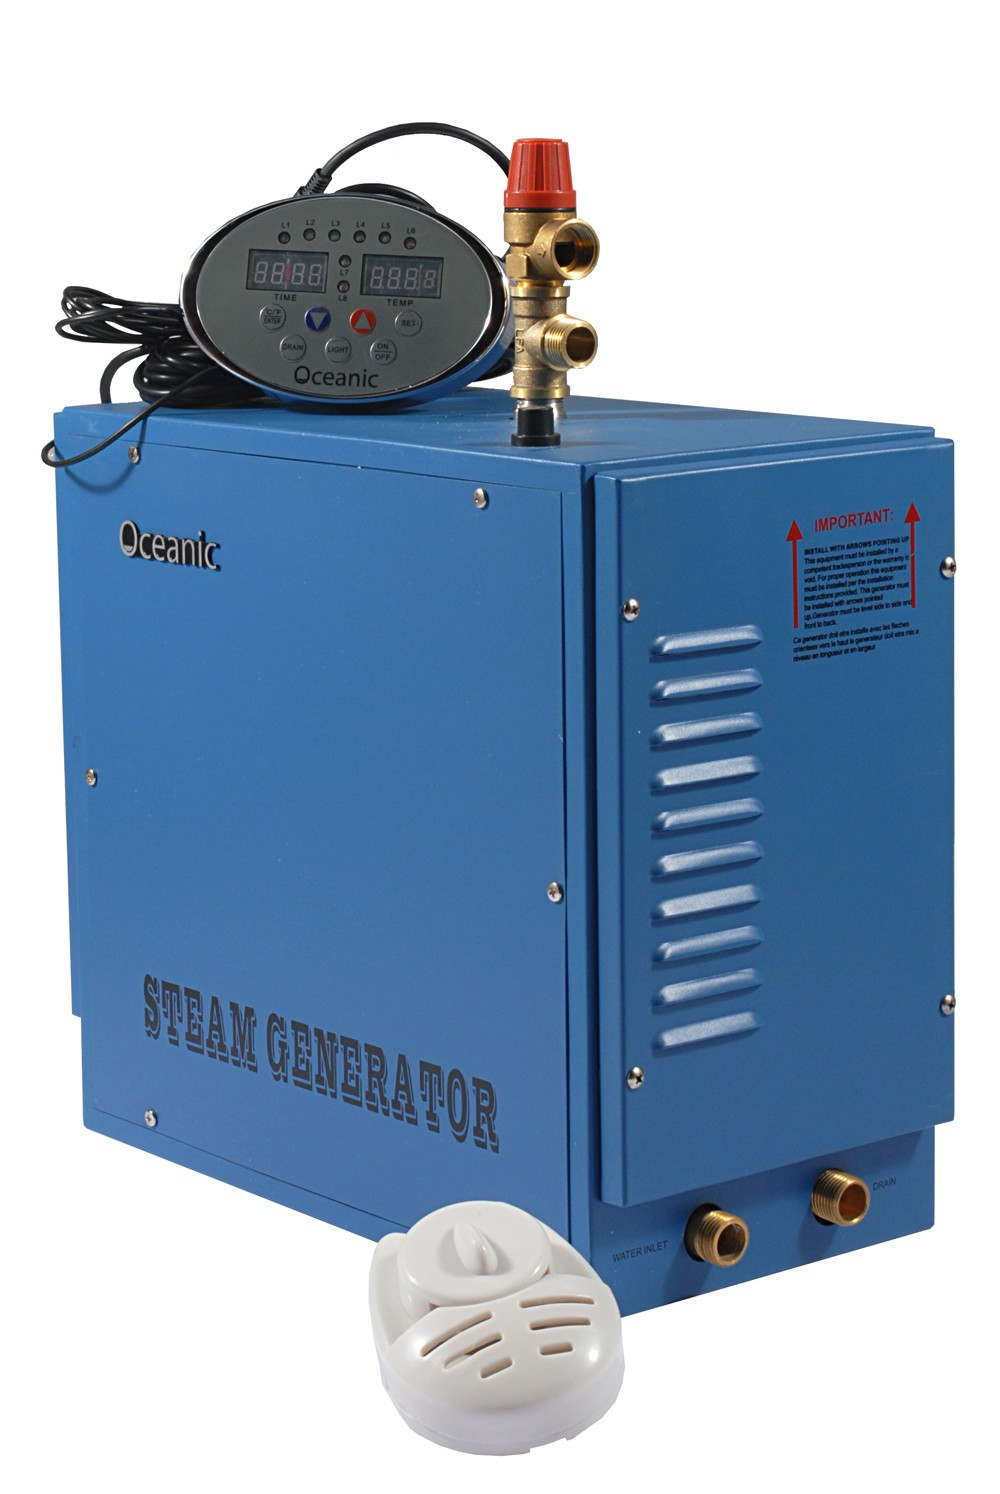 Generatore Di Vapore Oceanic Da 3kW Per Bagno Turco Casalingo